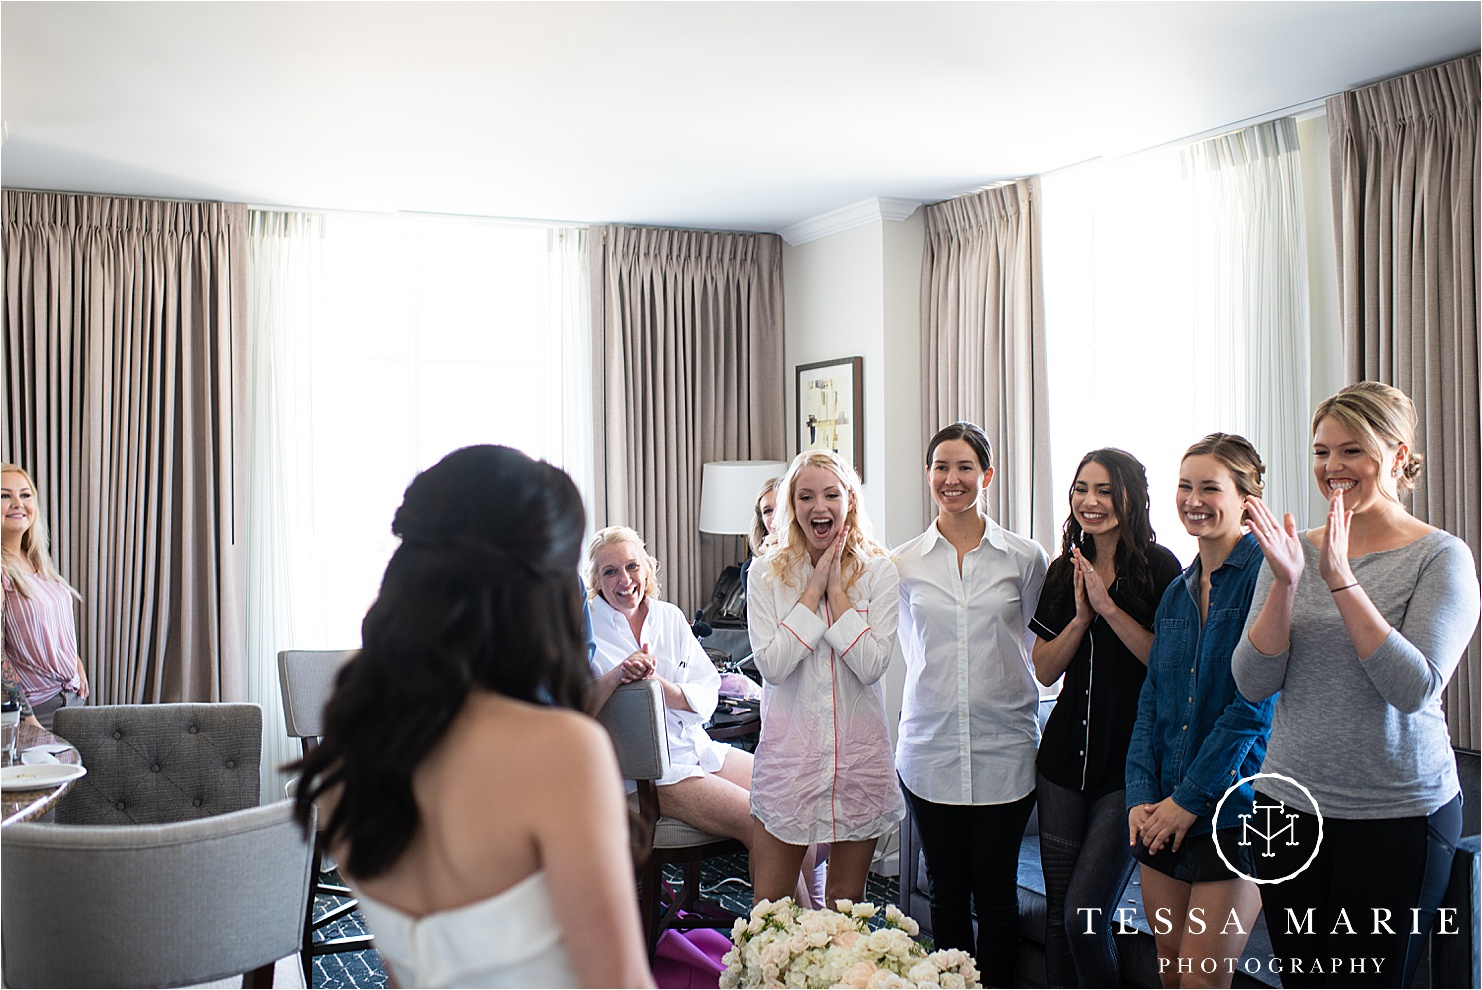 Tessa_marie_weddings_houston_wedding_photographer_The_astorian_0027.jpg